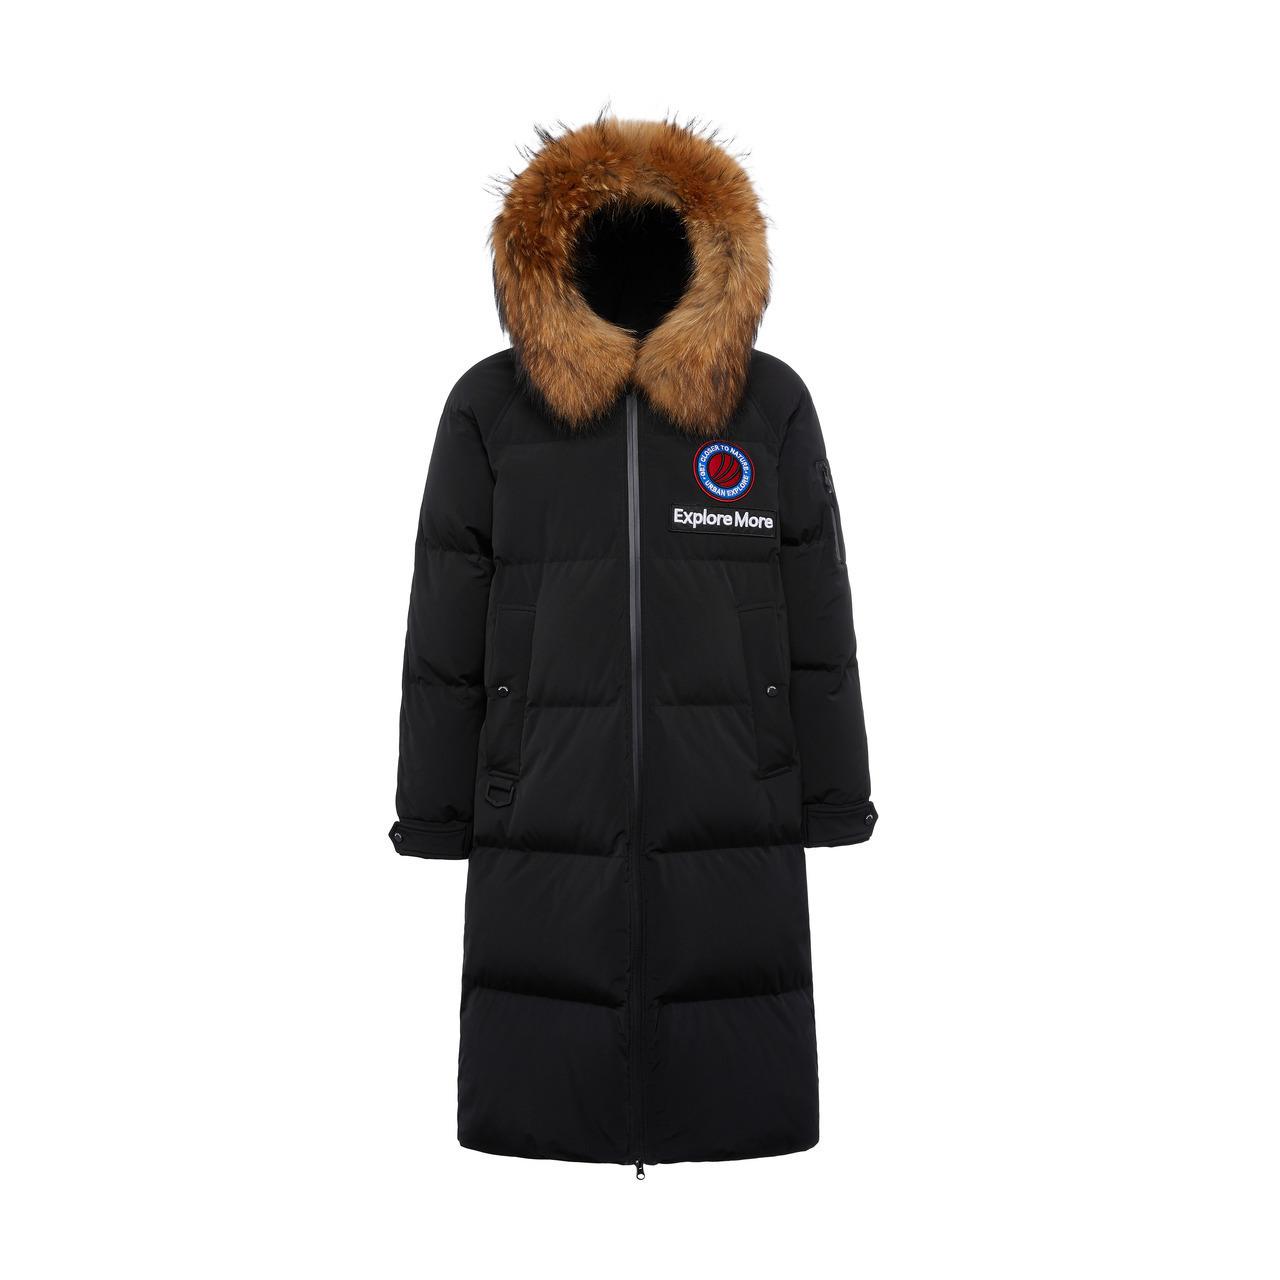 B80142153 波司登长款鹅绒羽绒服男士时尚大毛领保暖加厚冬装外套